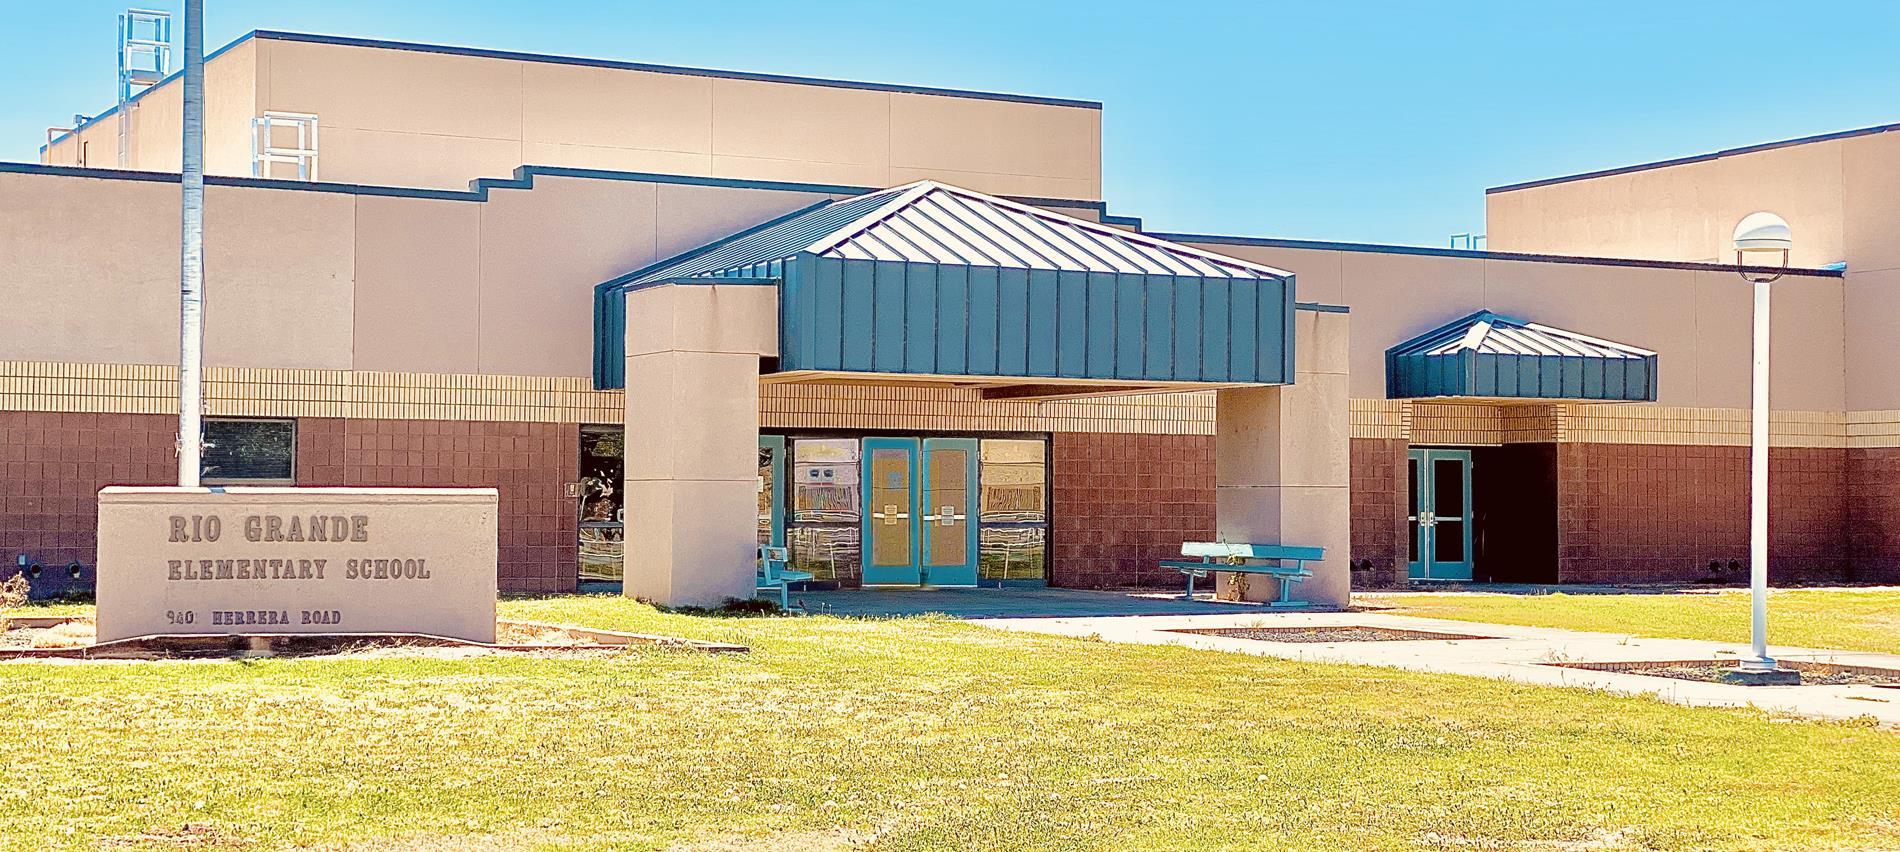 Rio Grande Elementary